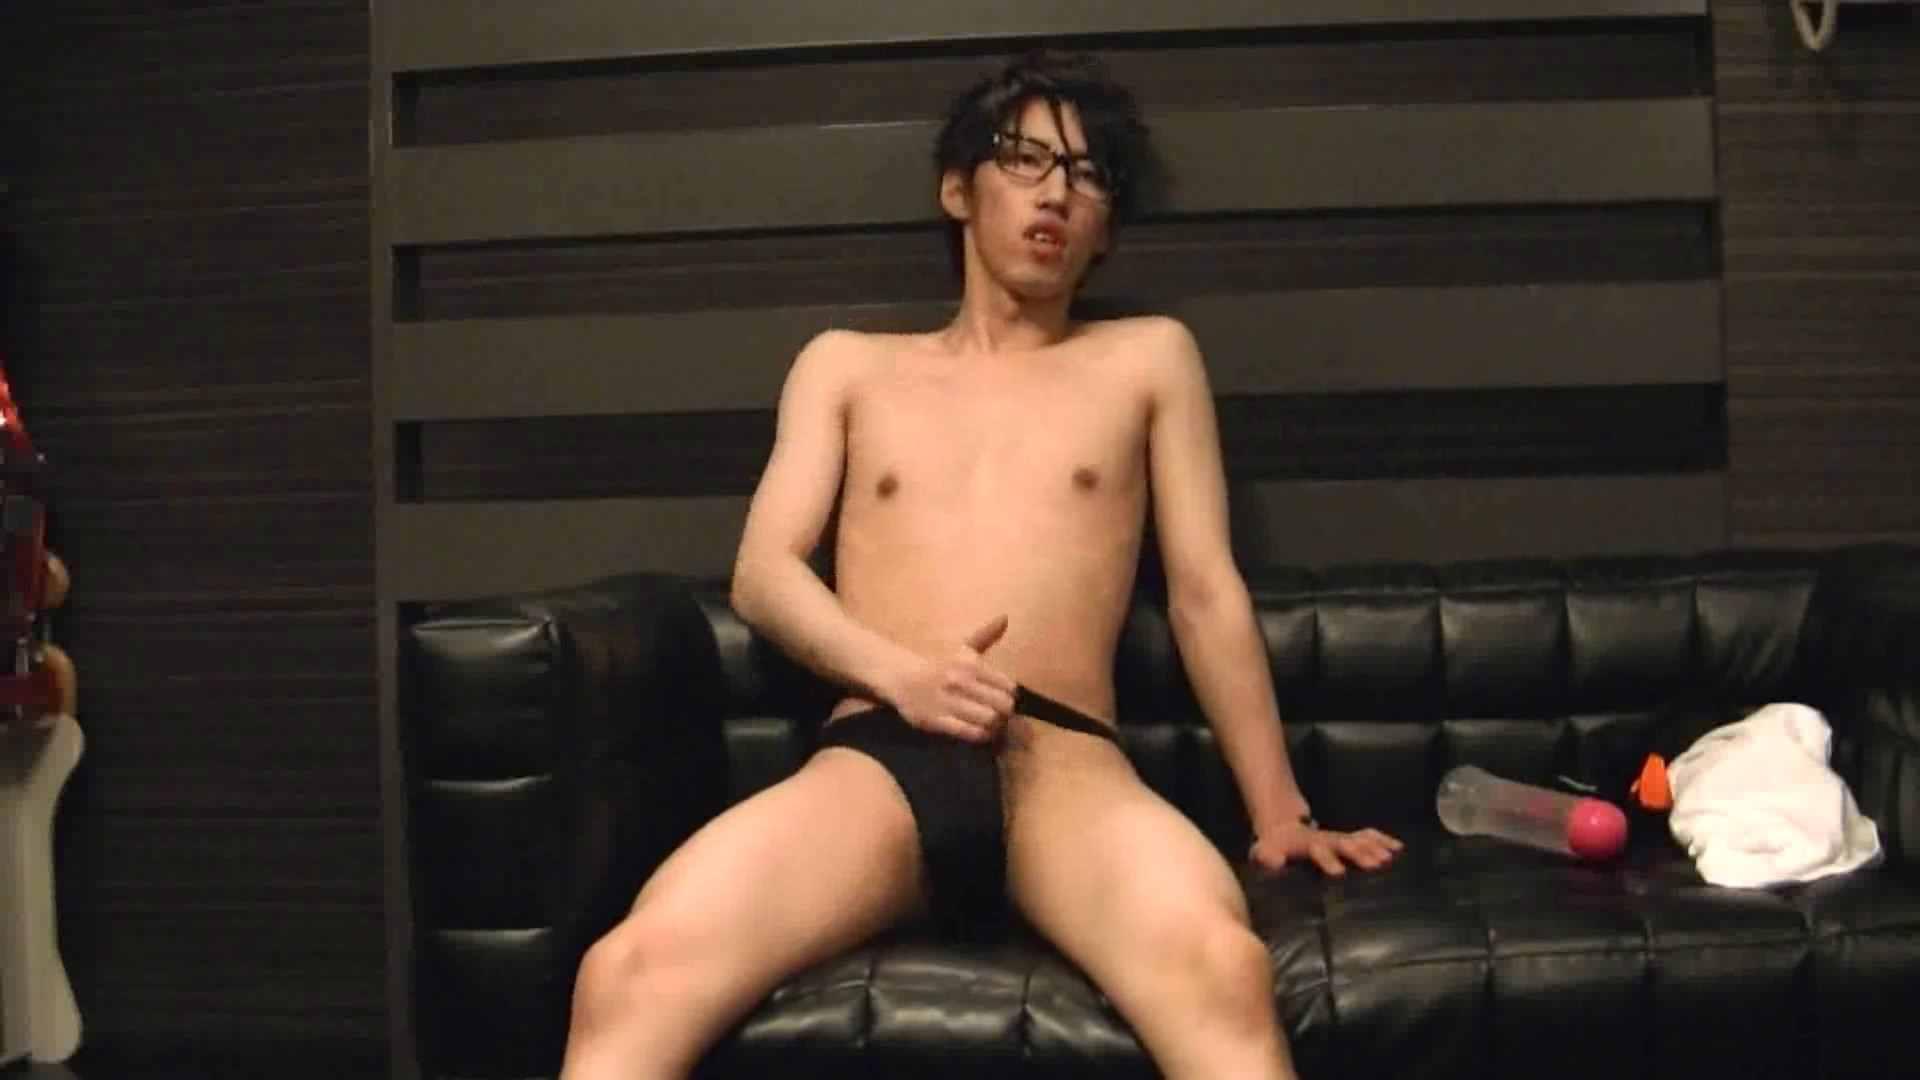 ONA見せカーニバル!! Vol3 男 ゲイ無料無修正画像 89枚 50